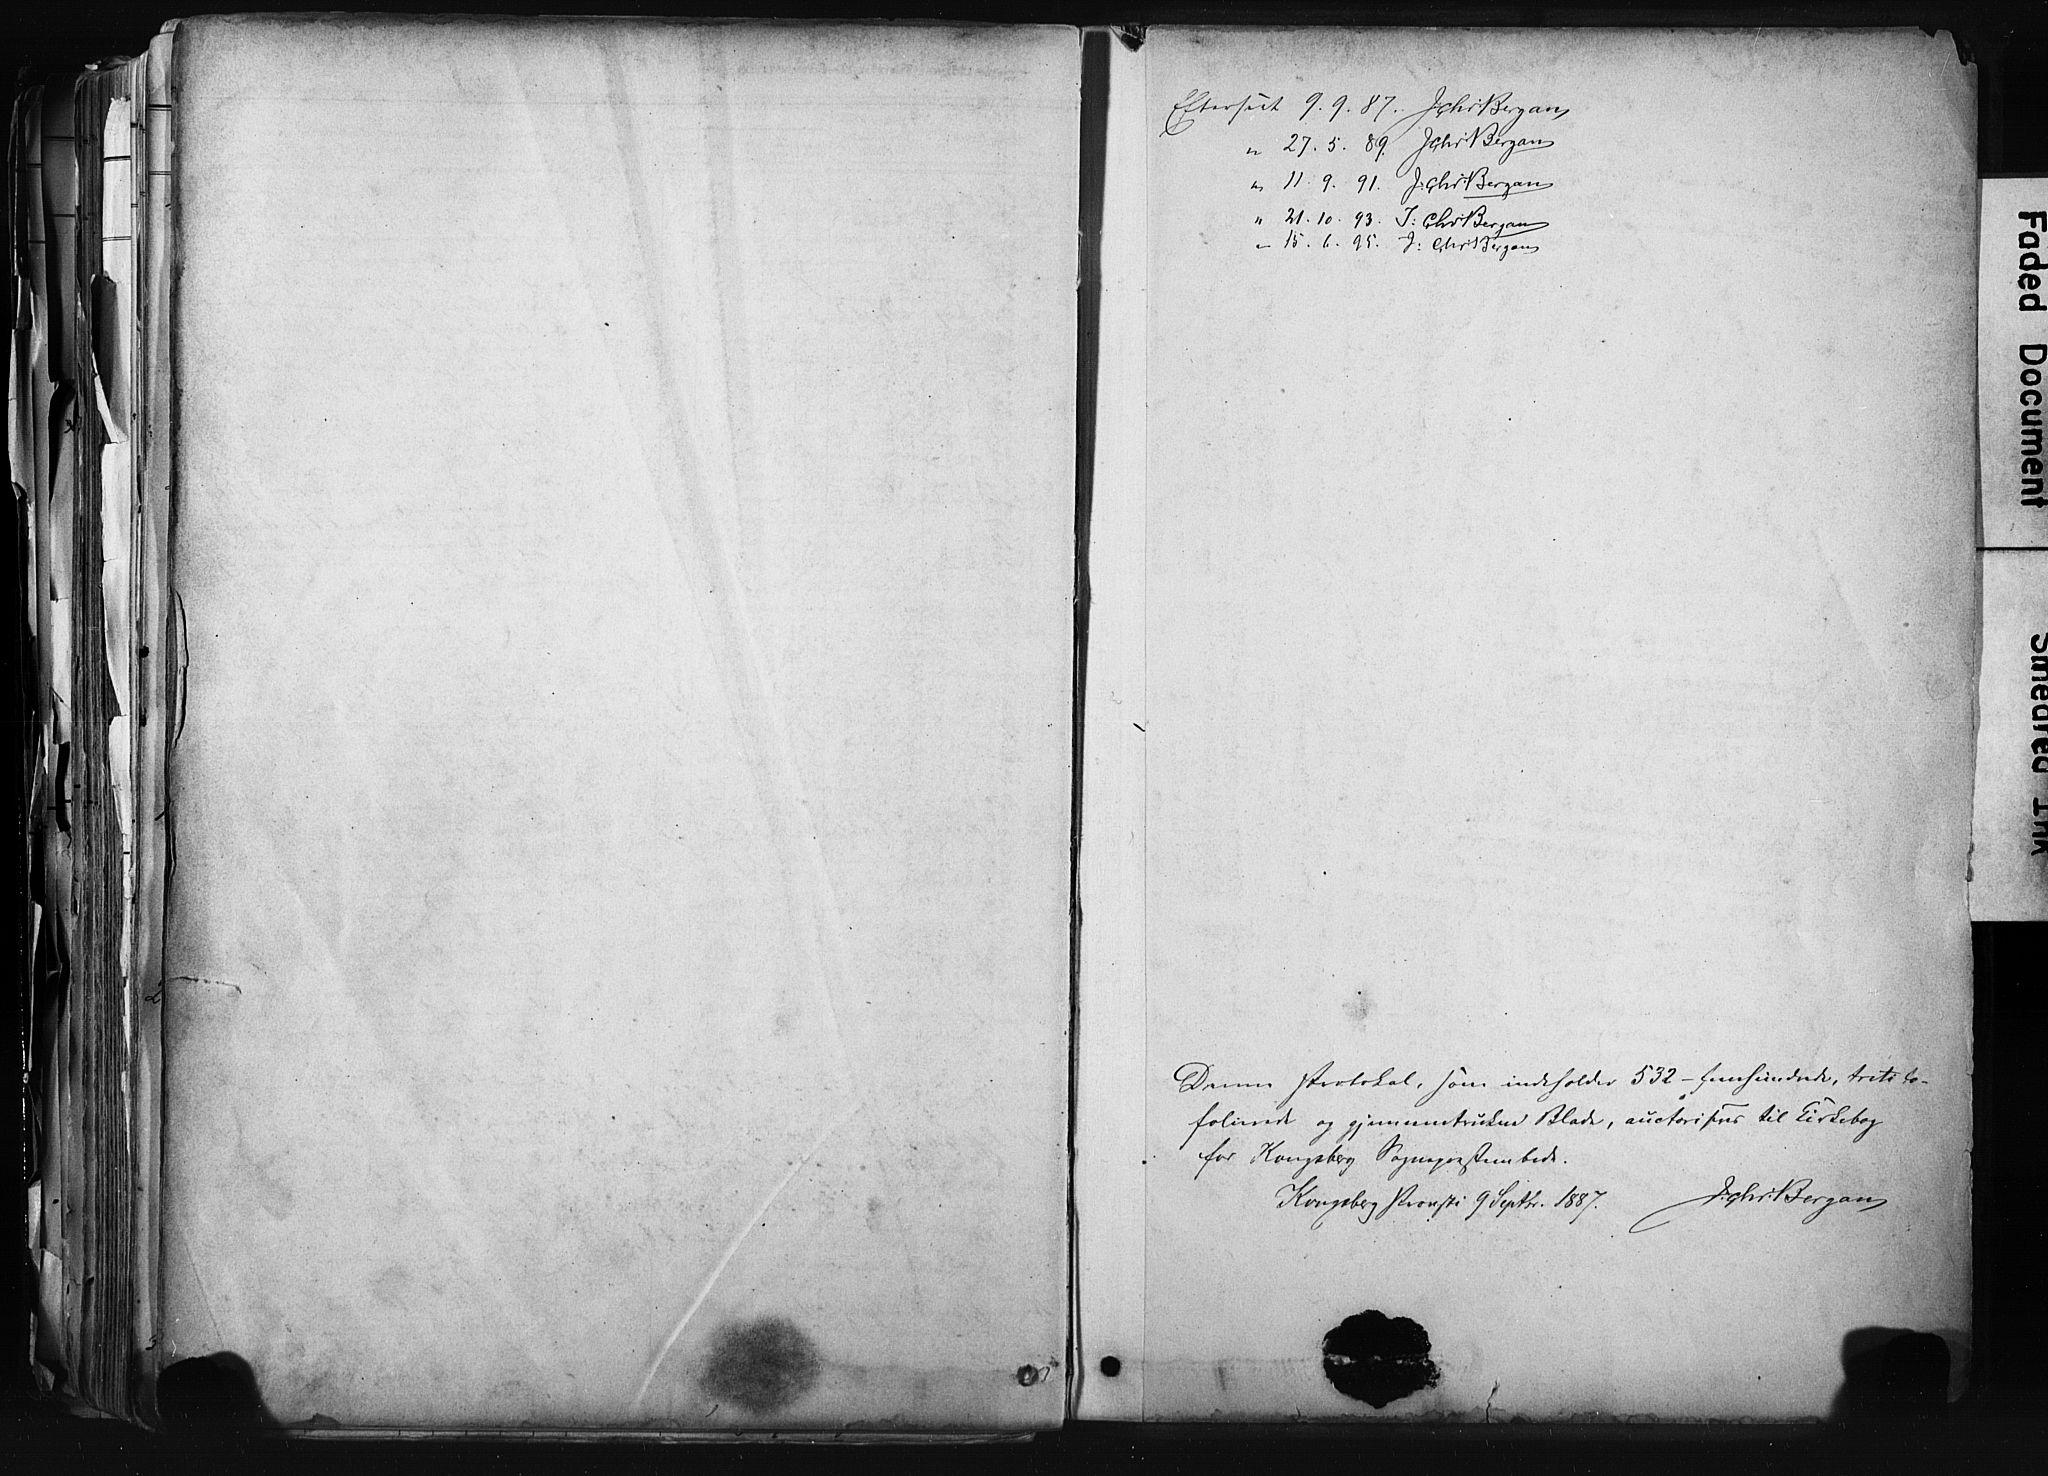 SAKO, Kongsberg kirkebøker, F/Fb/L0002: Ministerialbok nr. II 2, 1886-1896